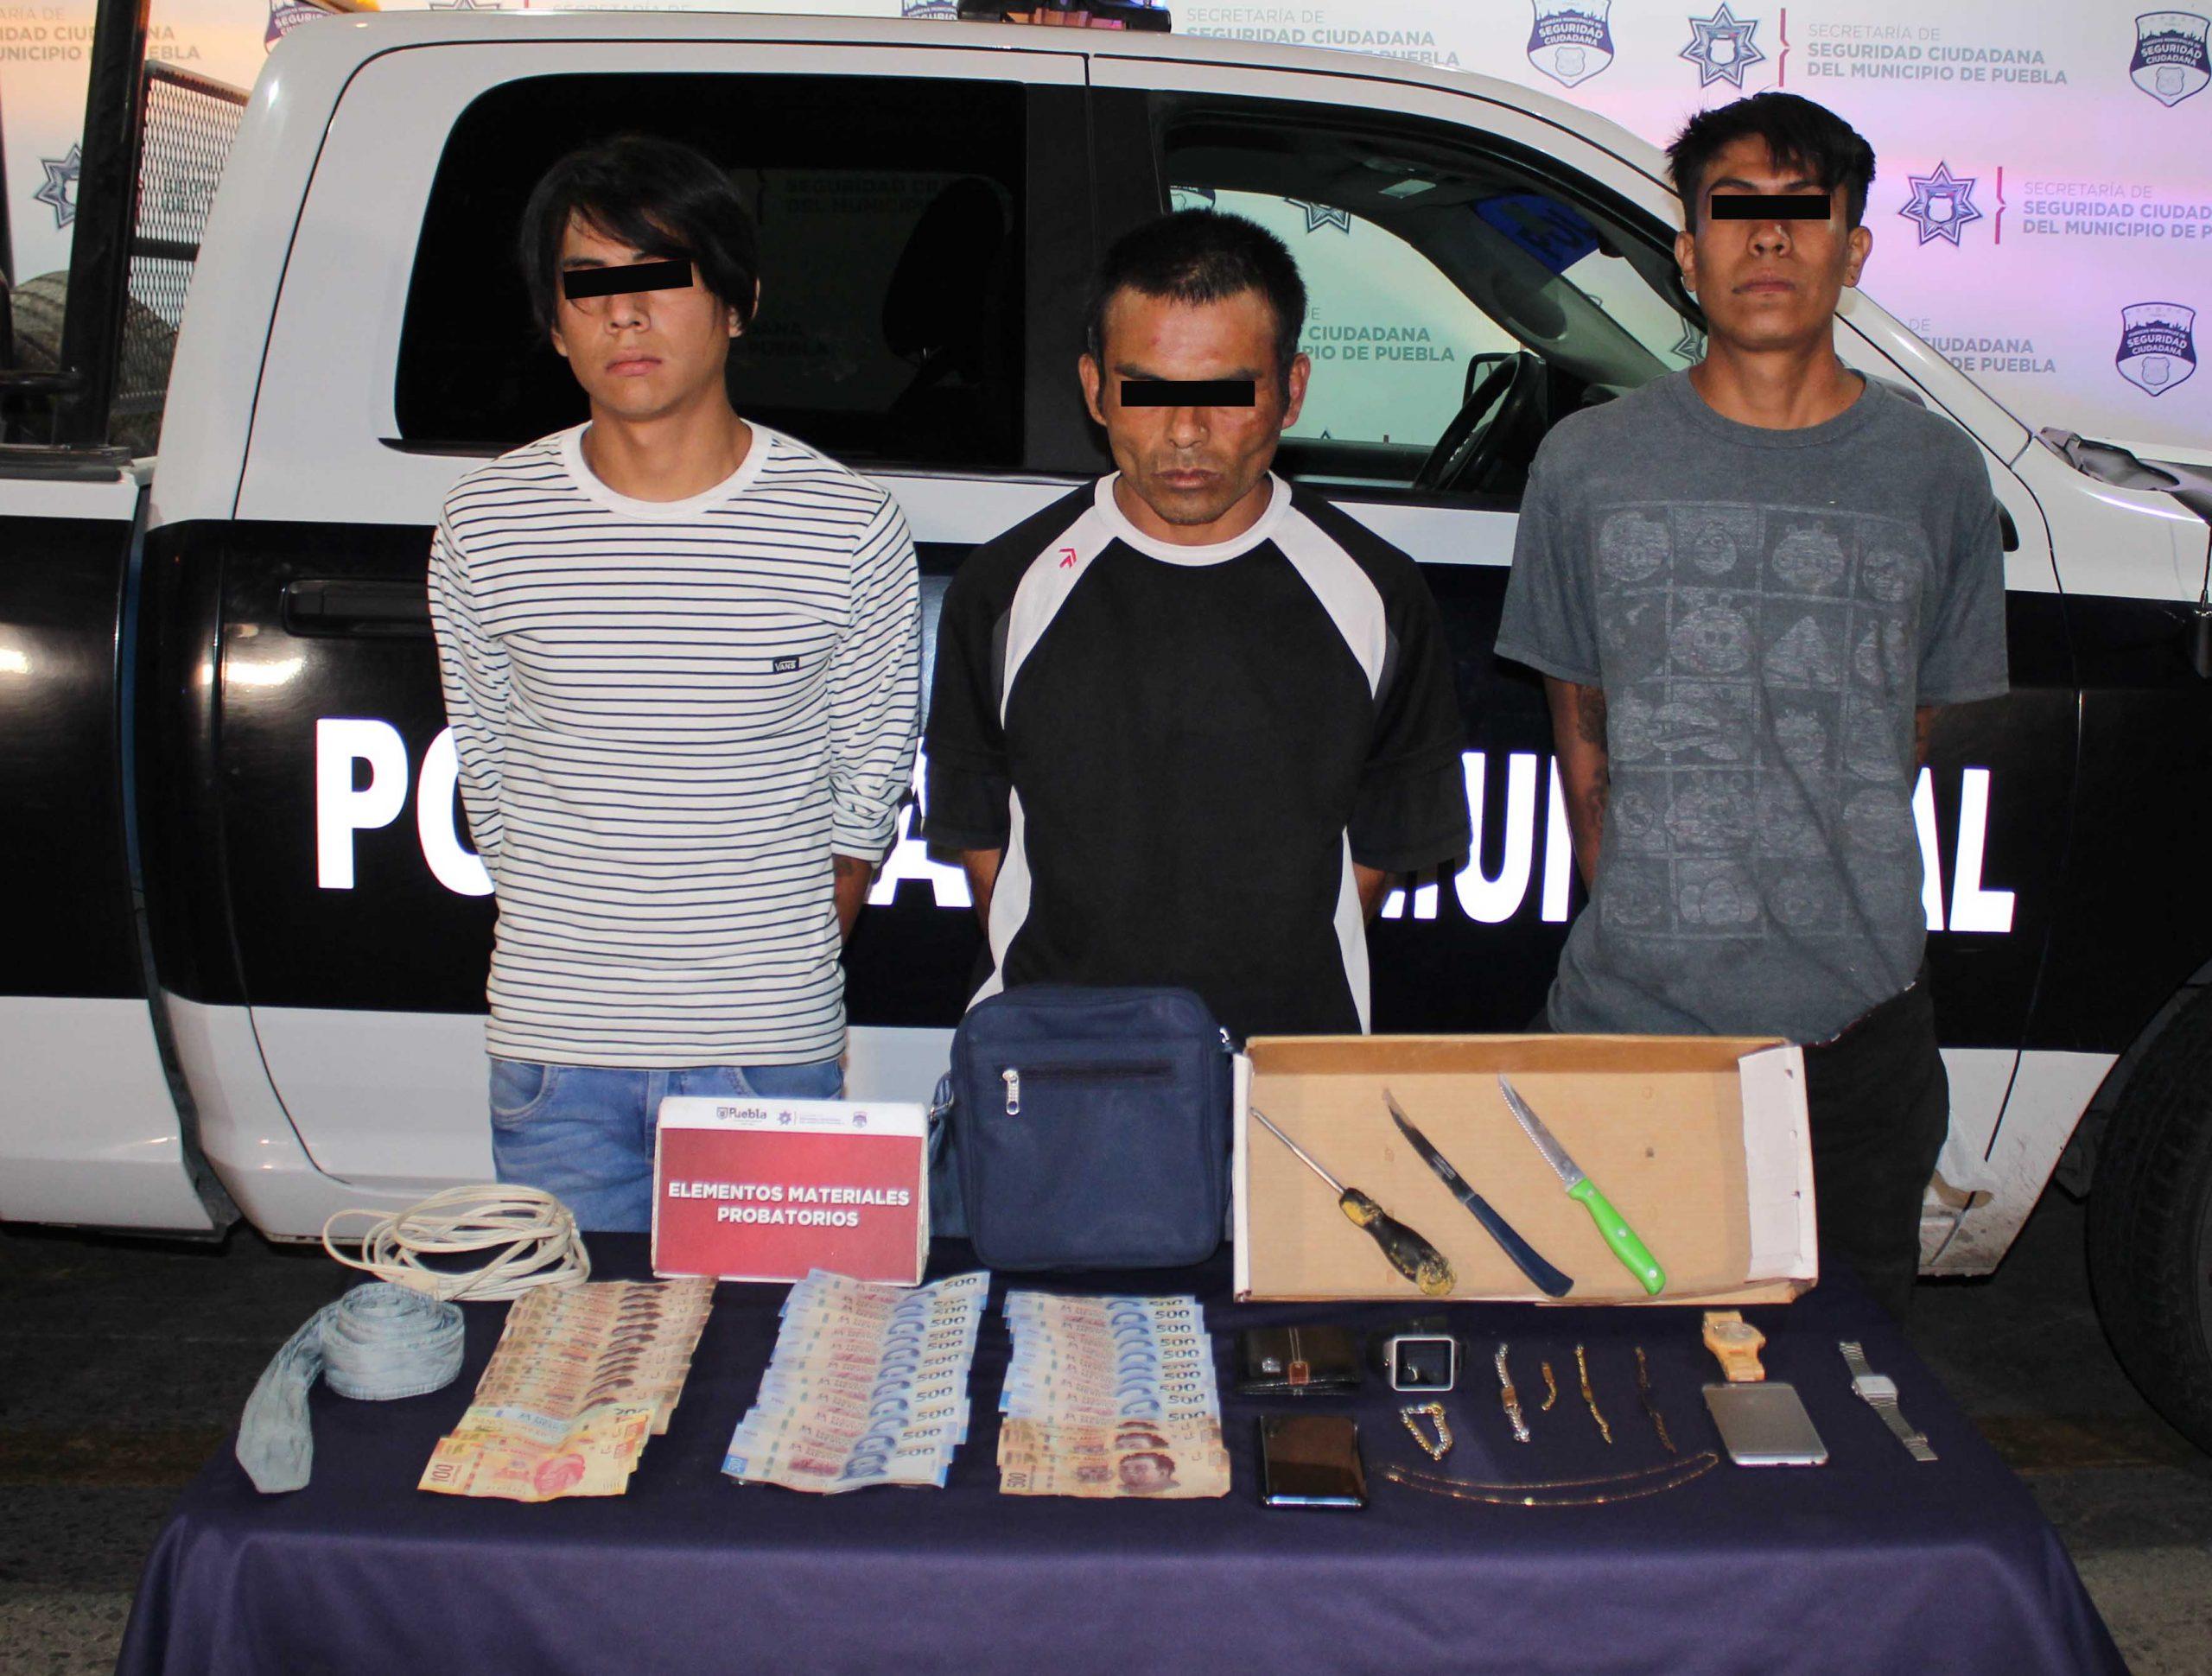 Detuvo Policía Municipal de Puebla a tres hombres por robo a casa habitación.